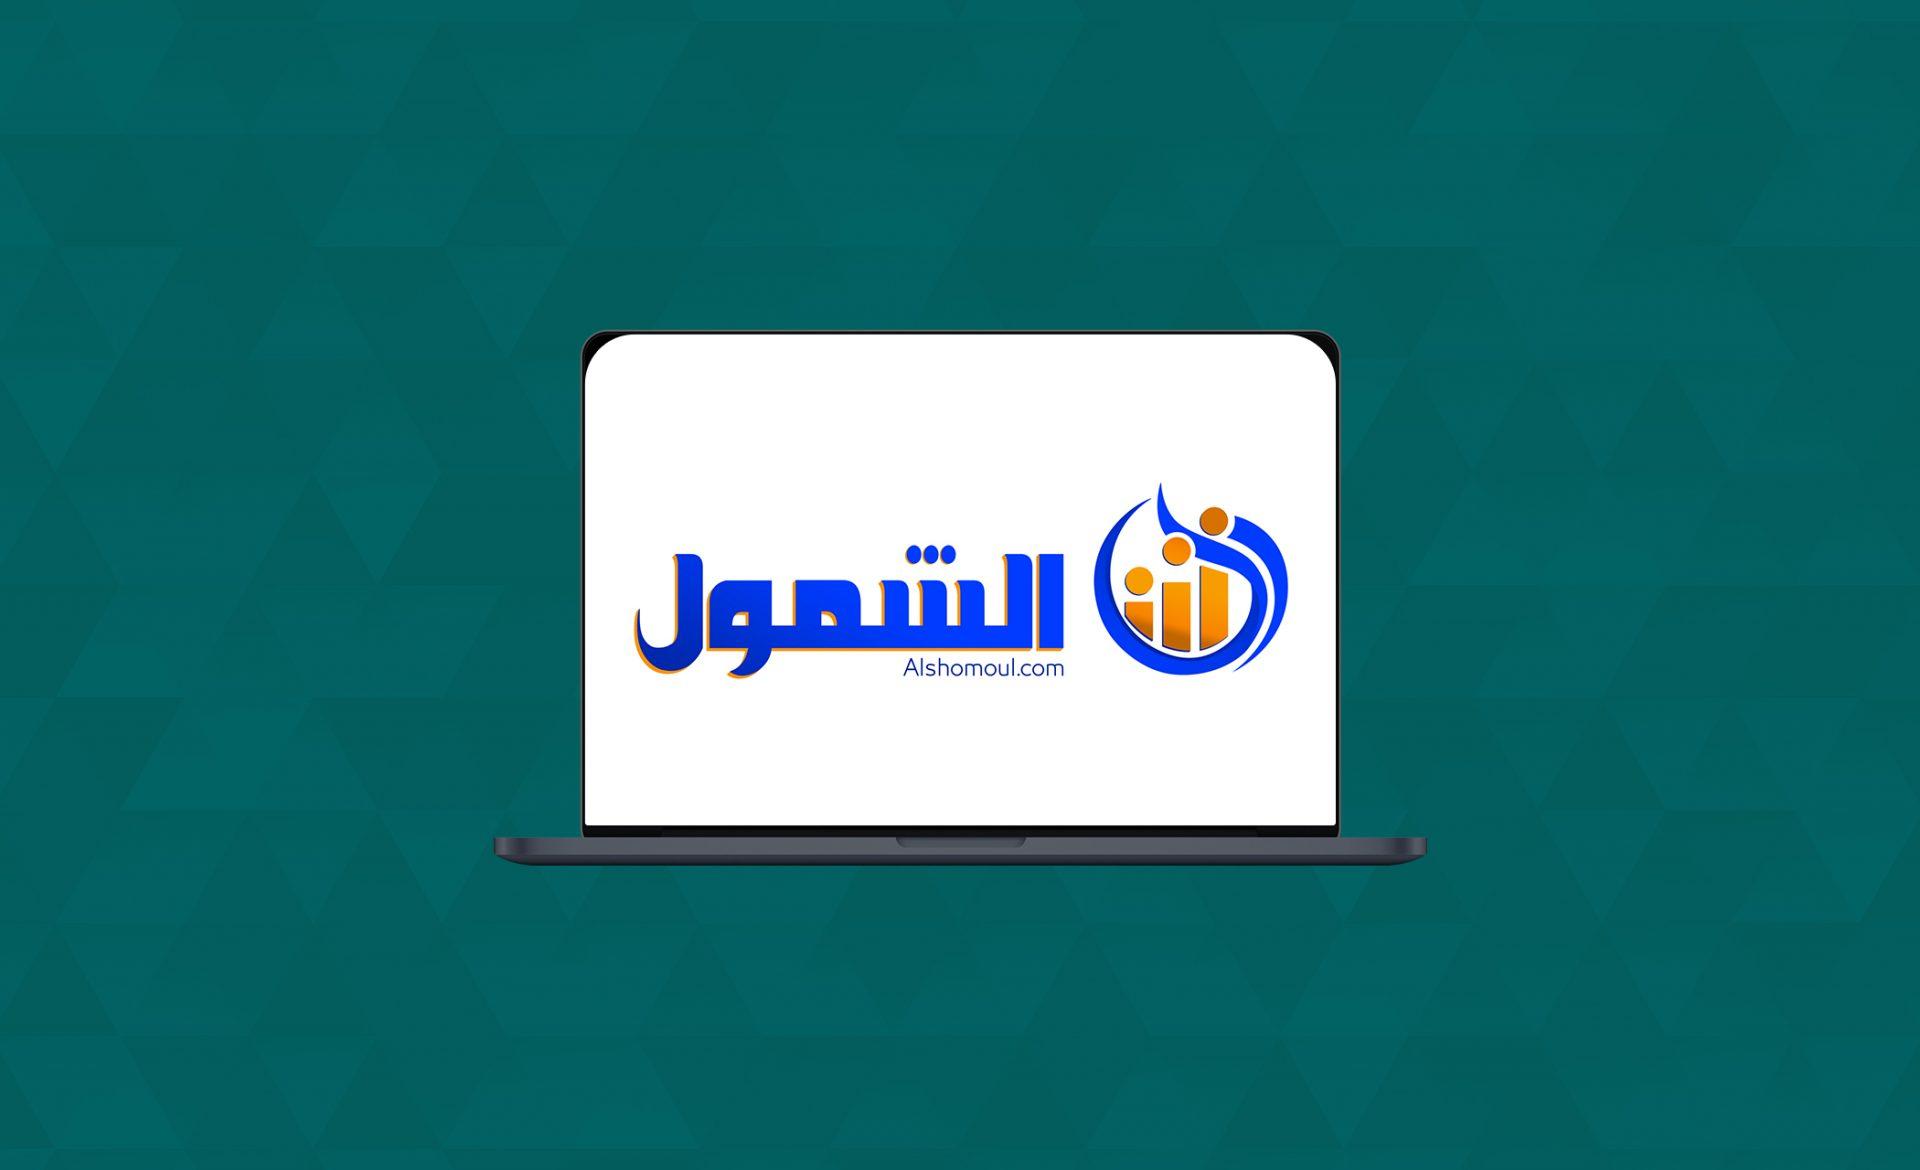 Alshomoul Logo